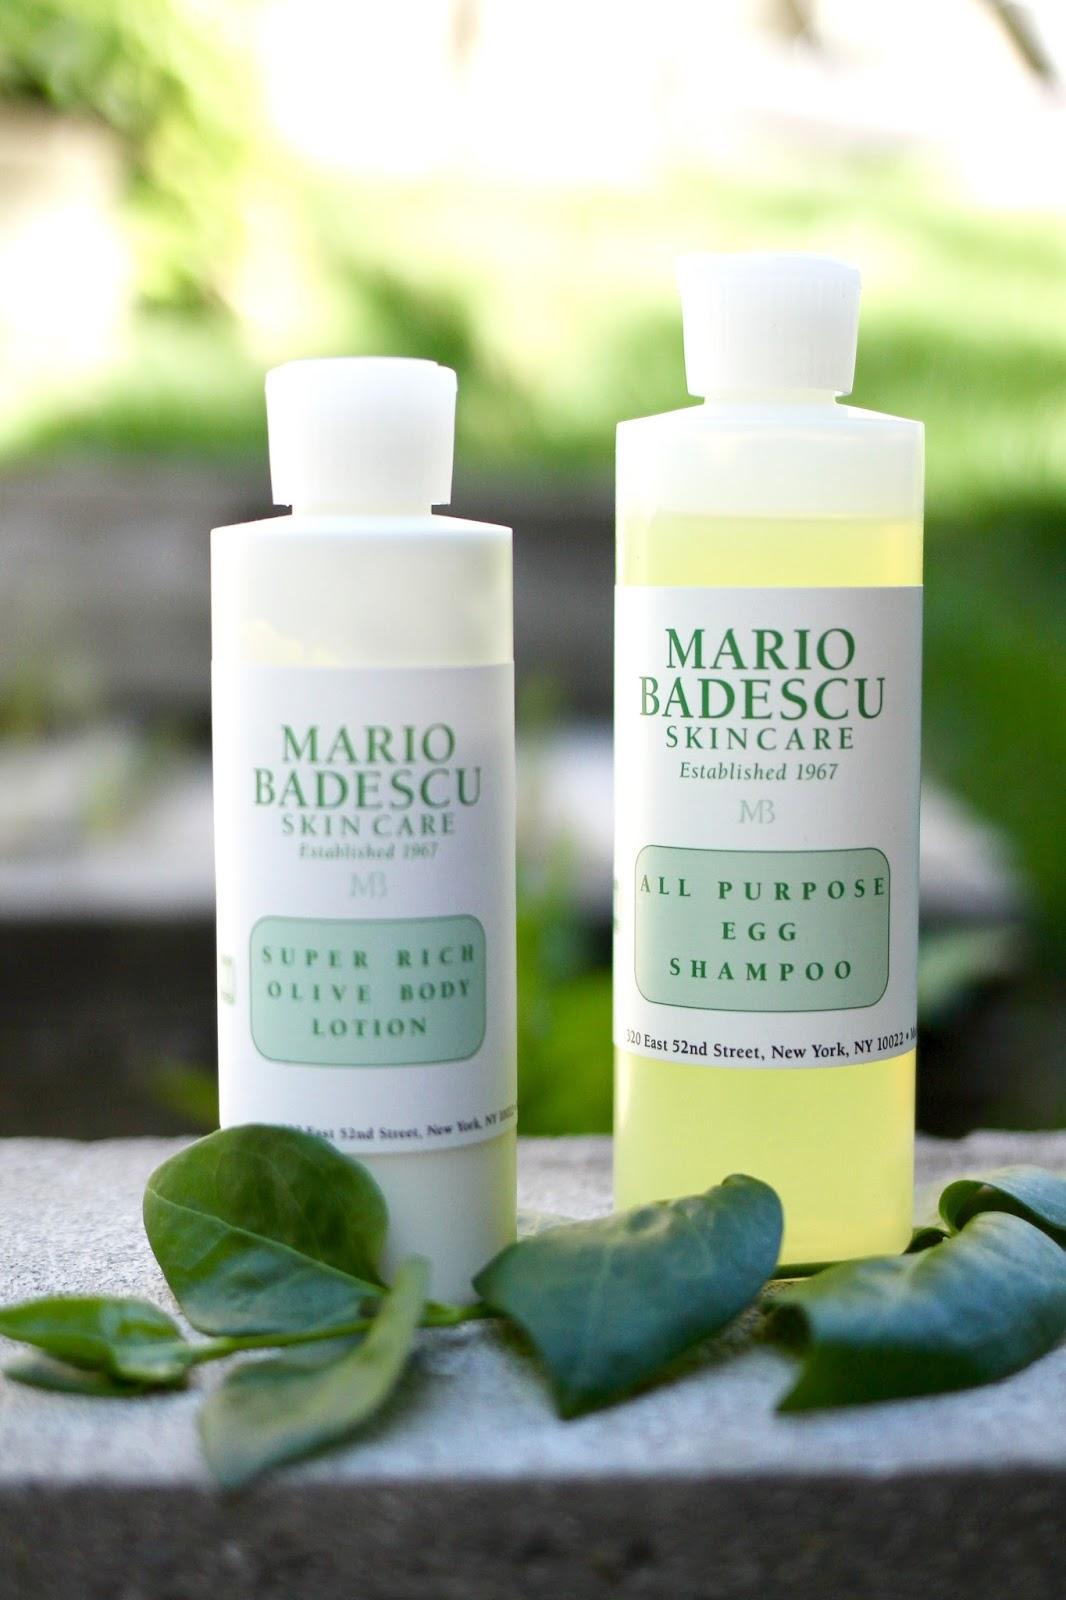 mario badescu egg shampoo, Mario badescu super rich olive oil lotion